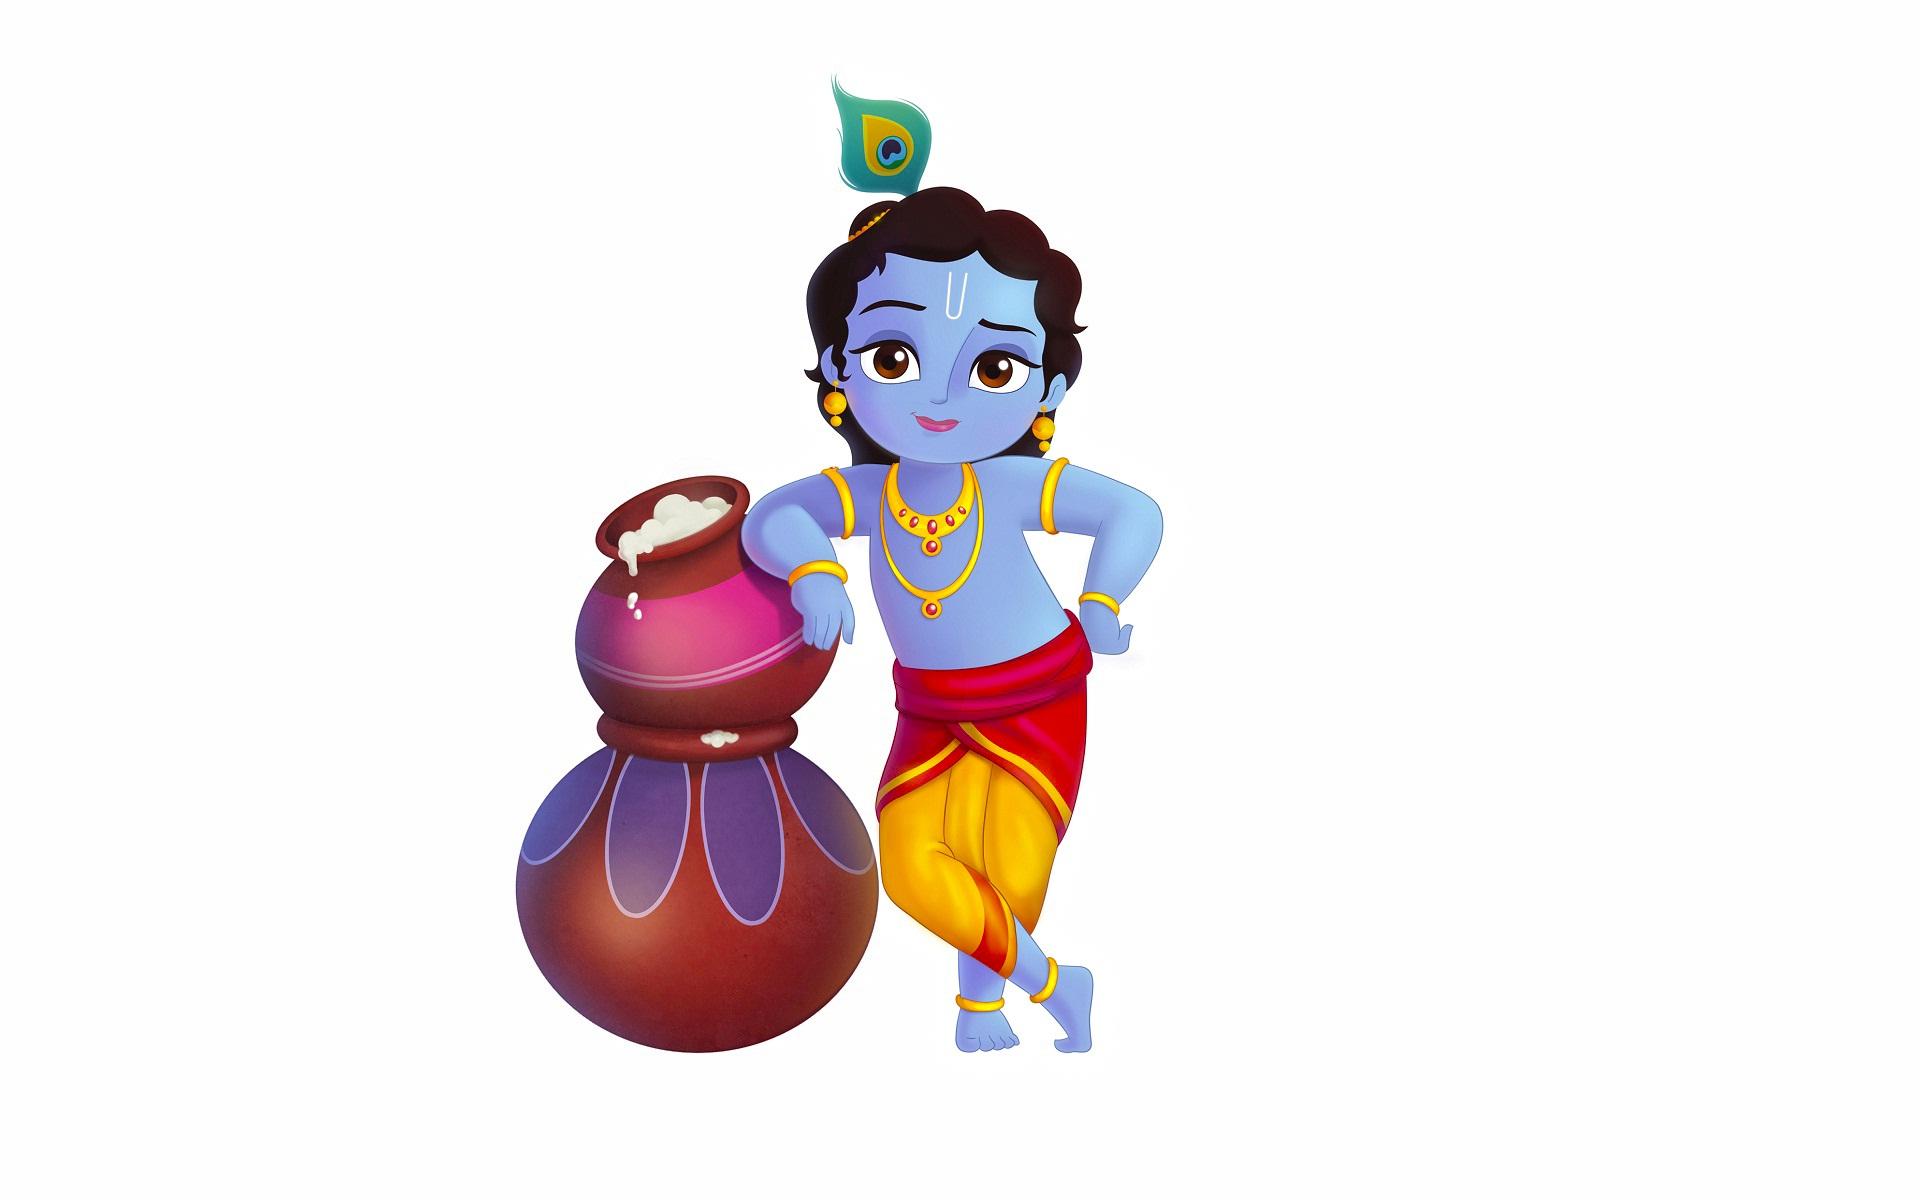 Krishna 3d Wallpaper For Mobile Animation Backgrounds Download Free Pixelstalk Net